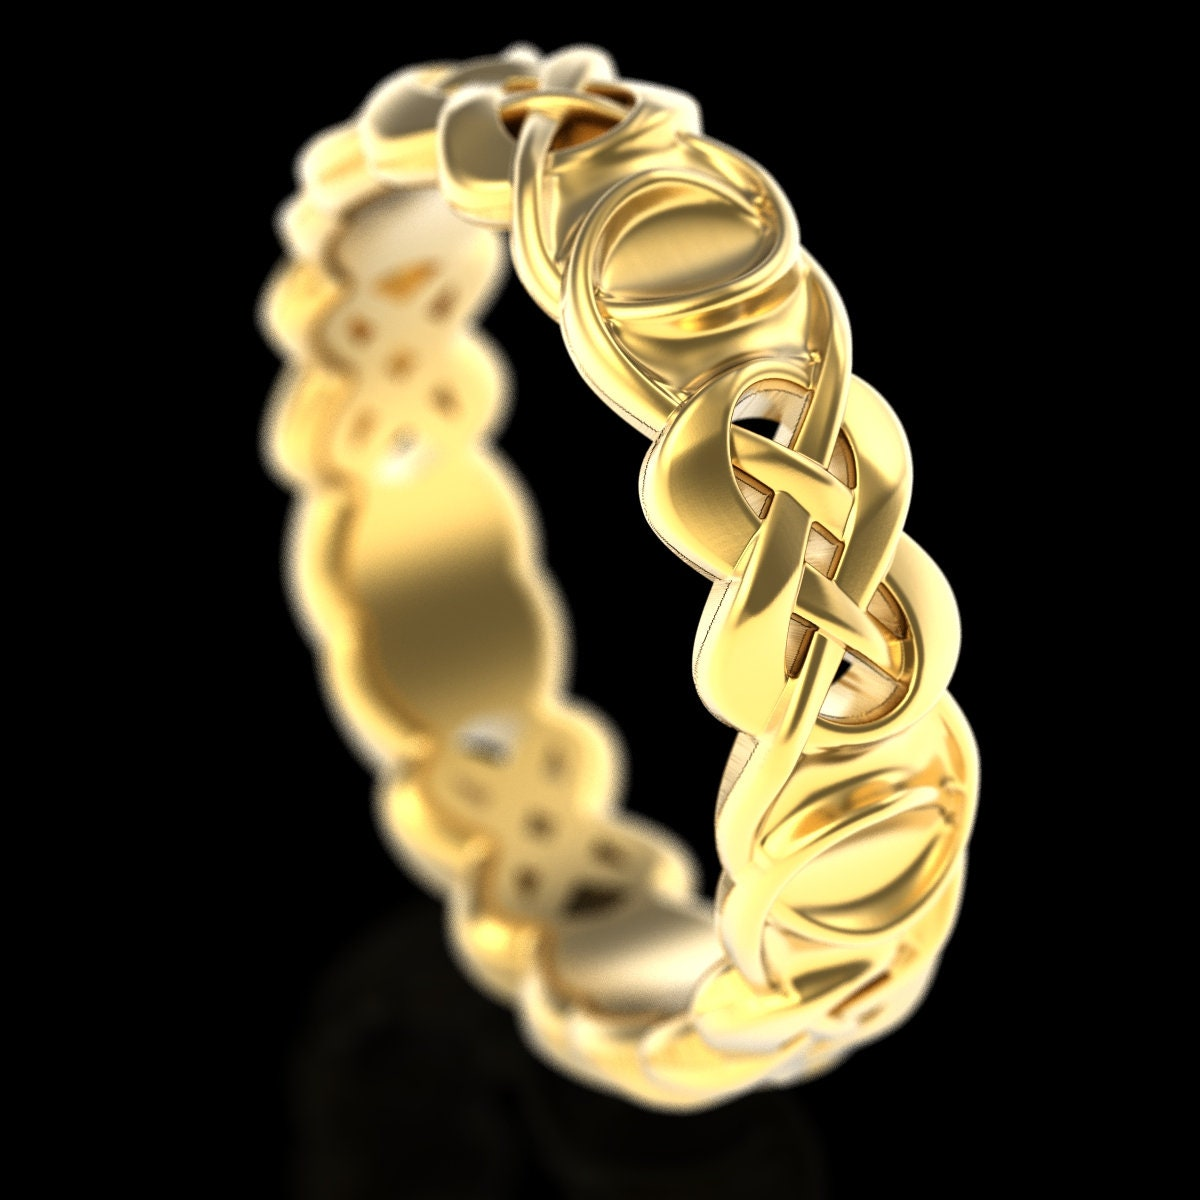 Gold Celtic Knot Wedding Ring Double Infinity Ring Woven Infinity Knot Ring 10k 14k 18k Gold Or Platinum Ring Custom Wedding Band 210